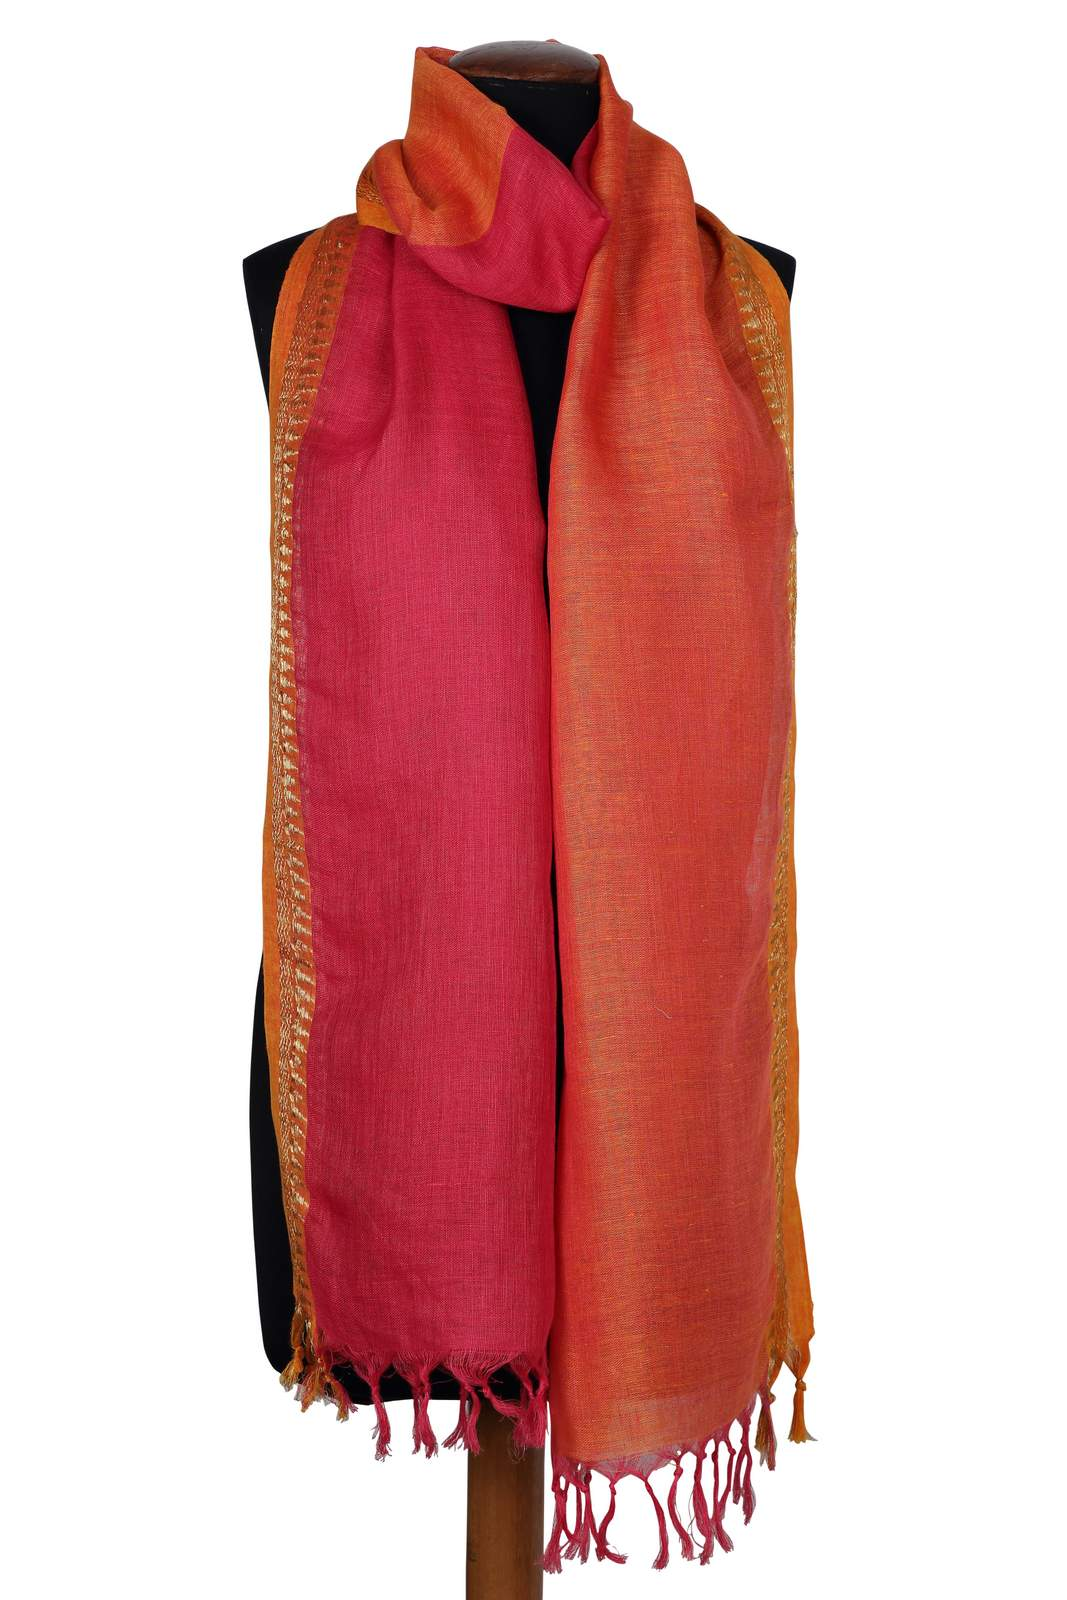 SCF Pink And Orange Dual Linen Scarf With Lurex Border One Size - Pink And Orange (One Size,Pink and Orange)